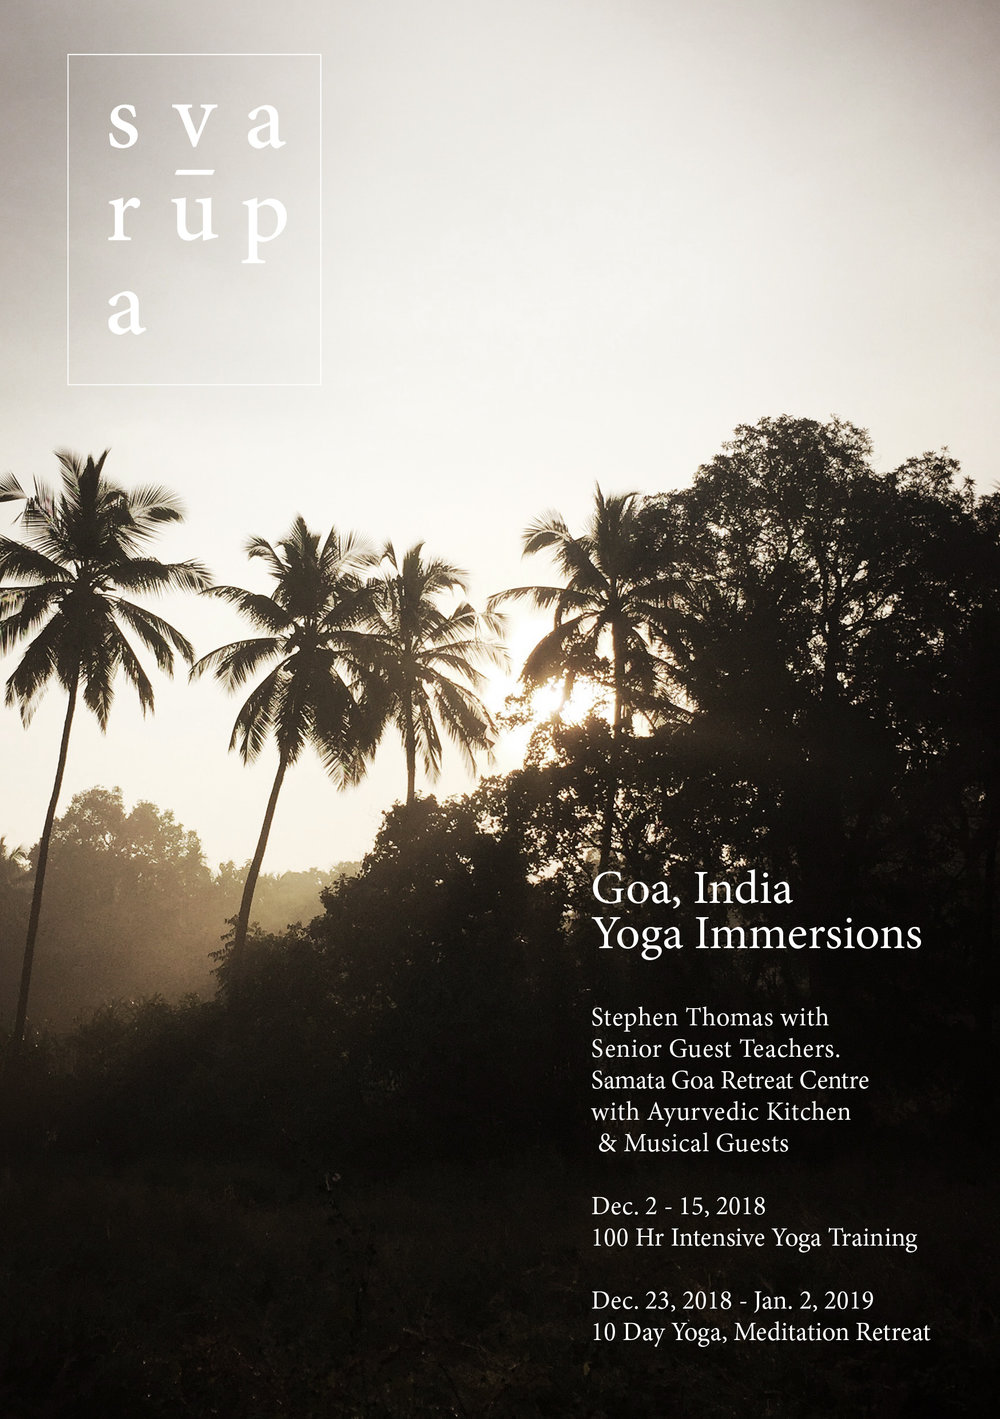 alexgerber_Grafikdesign_Svarupa_Flyer Goa 18_01.jpg